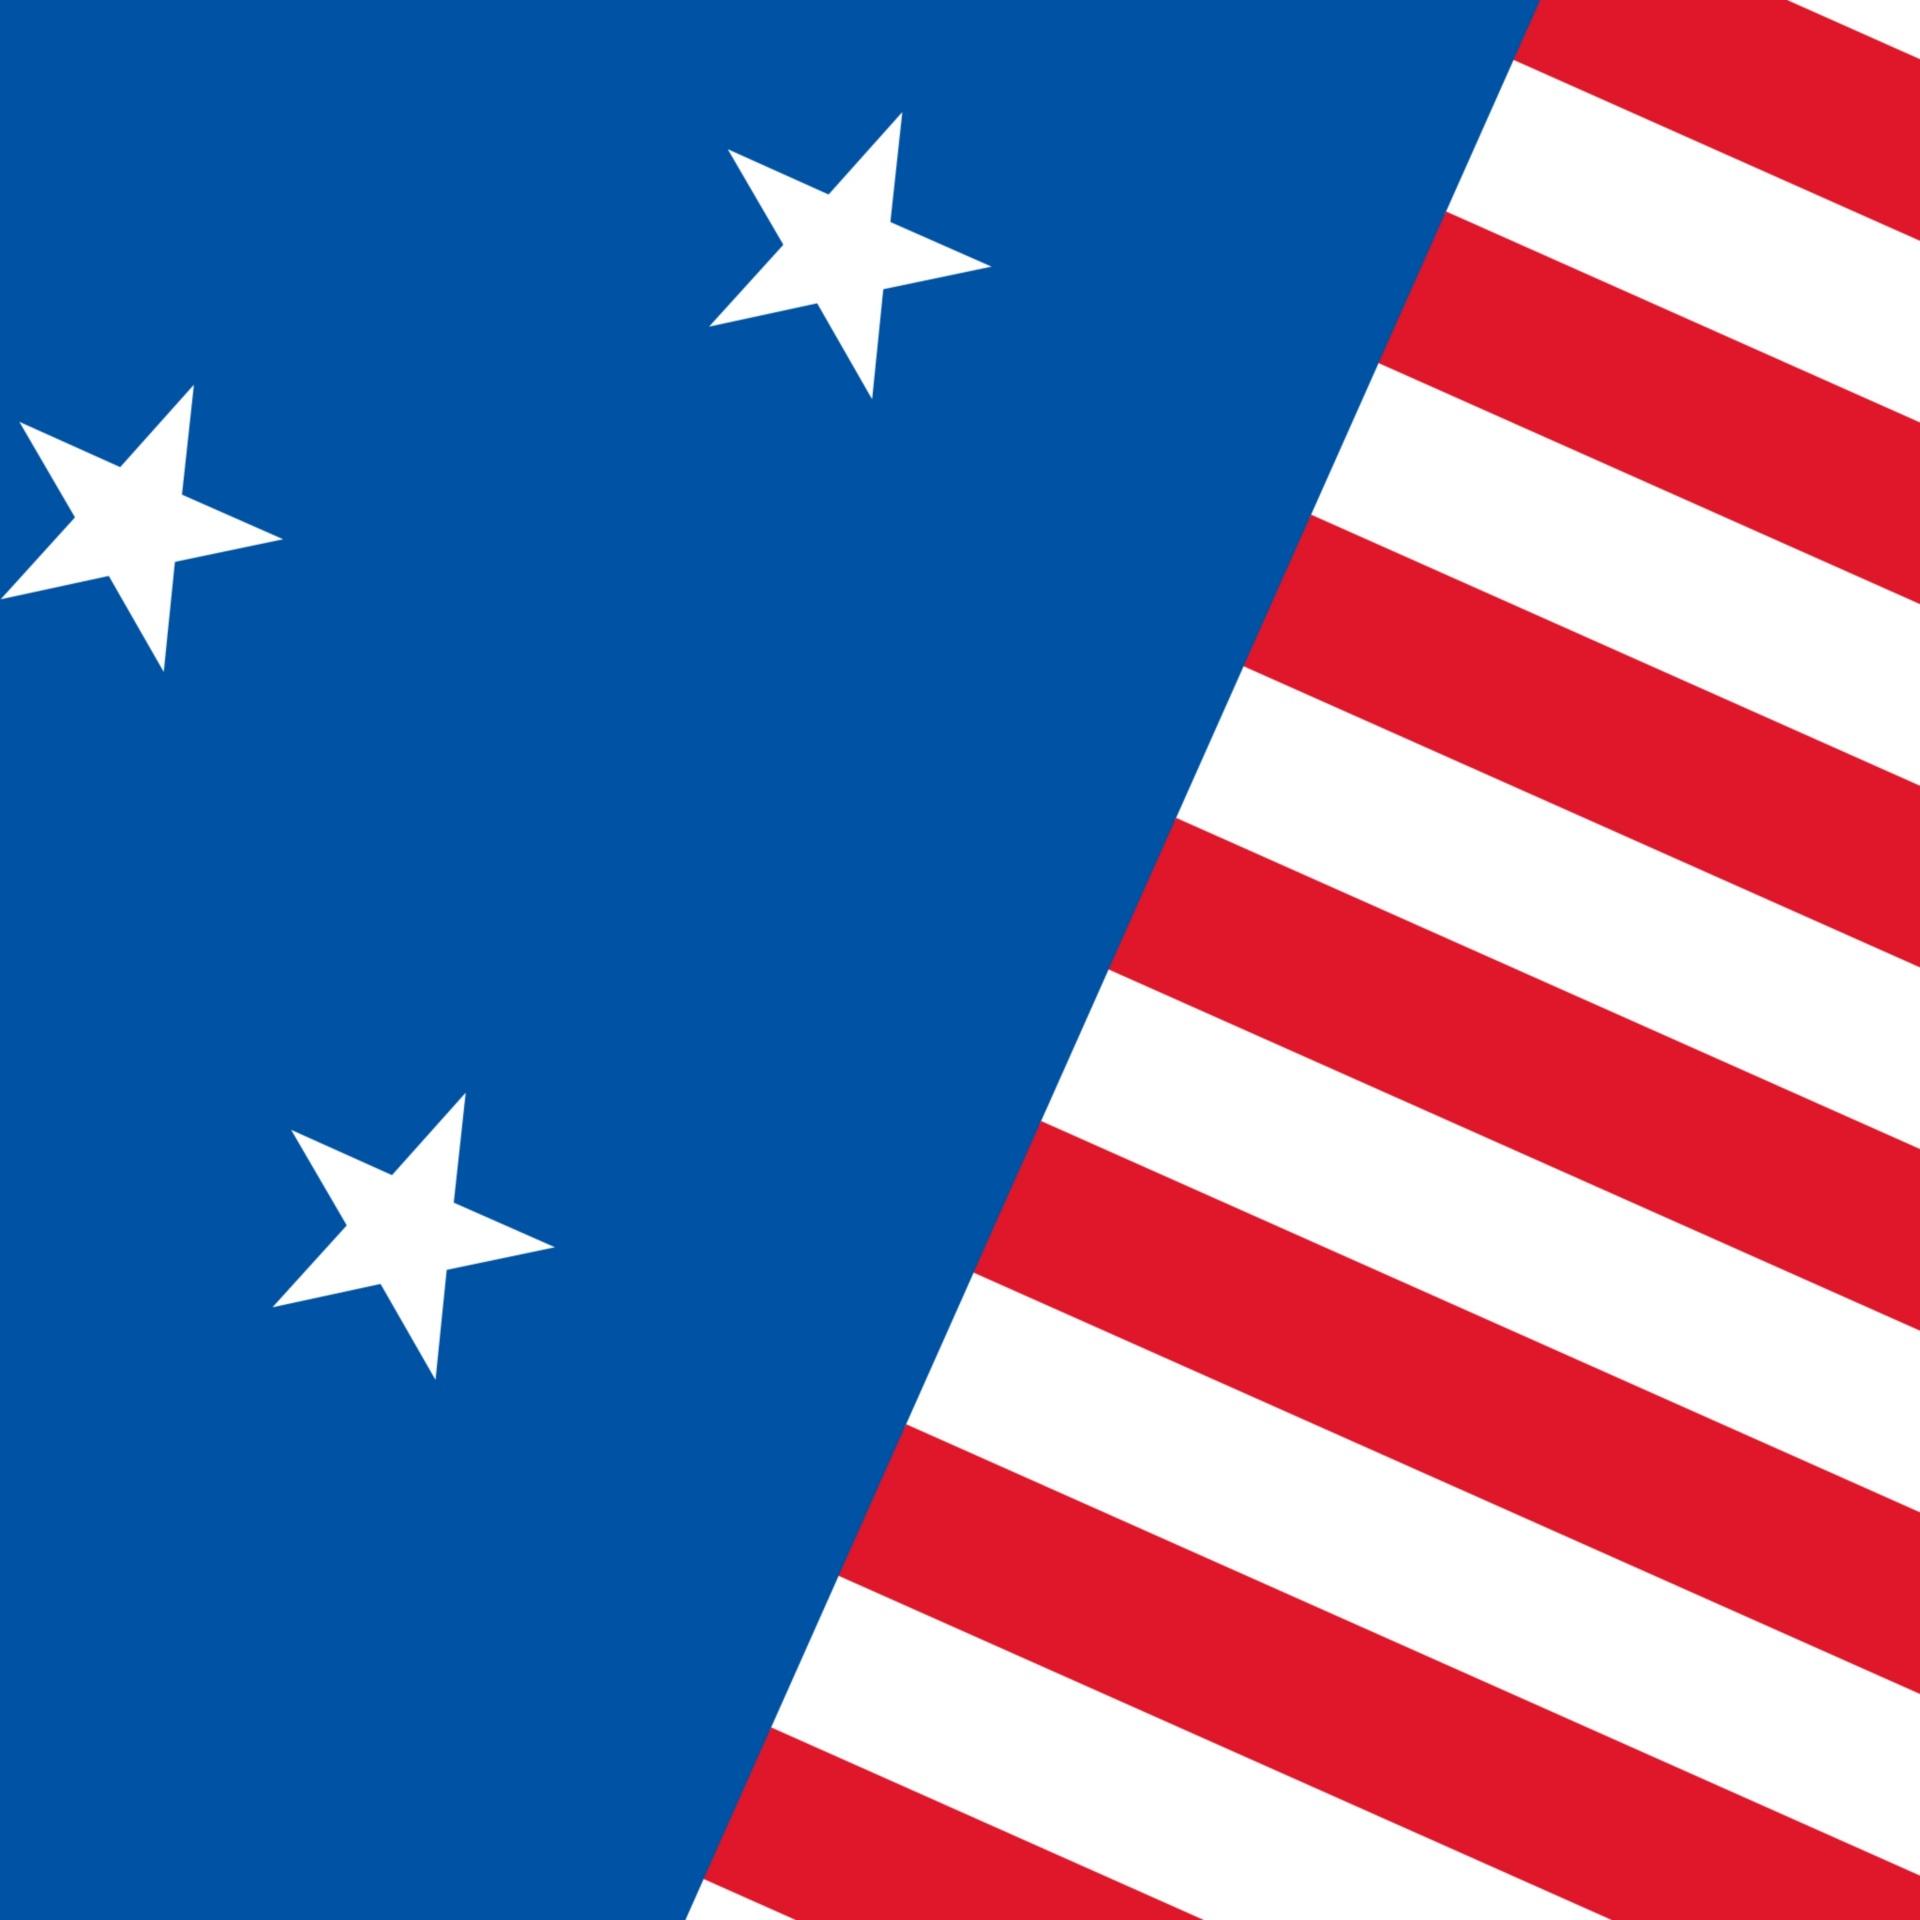 1920x1920 American Flag 2 Free Stock Photo